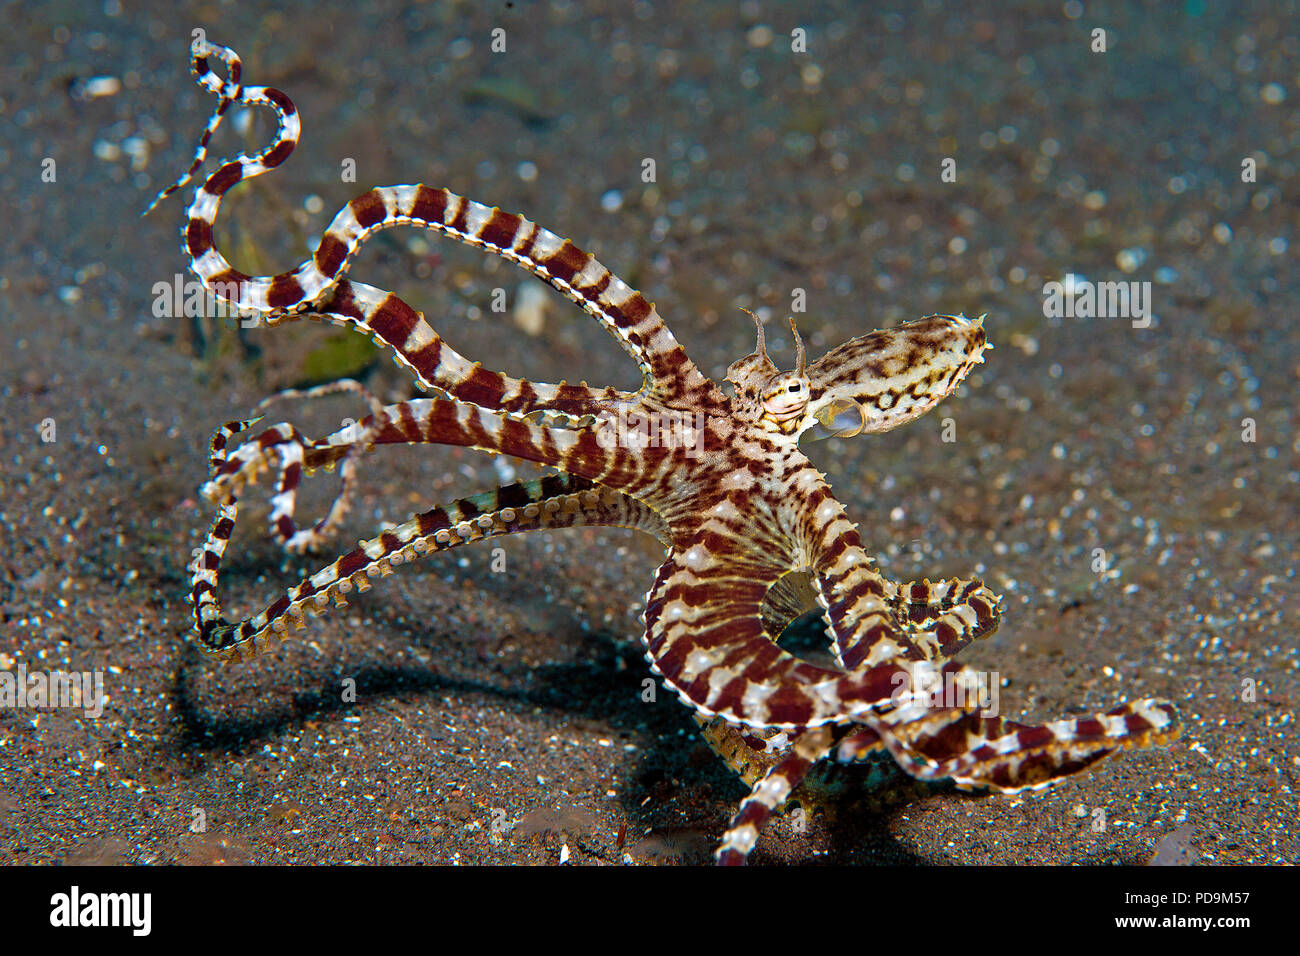 Wonderpus octopus (Wunderpus photogenicus) at sea bottom, Komodo National Park, Komodo Island, small Sunda Islands, Indonesia - Stock Image